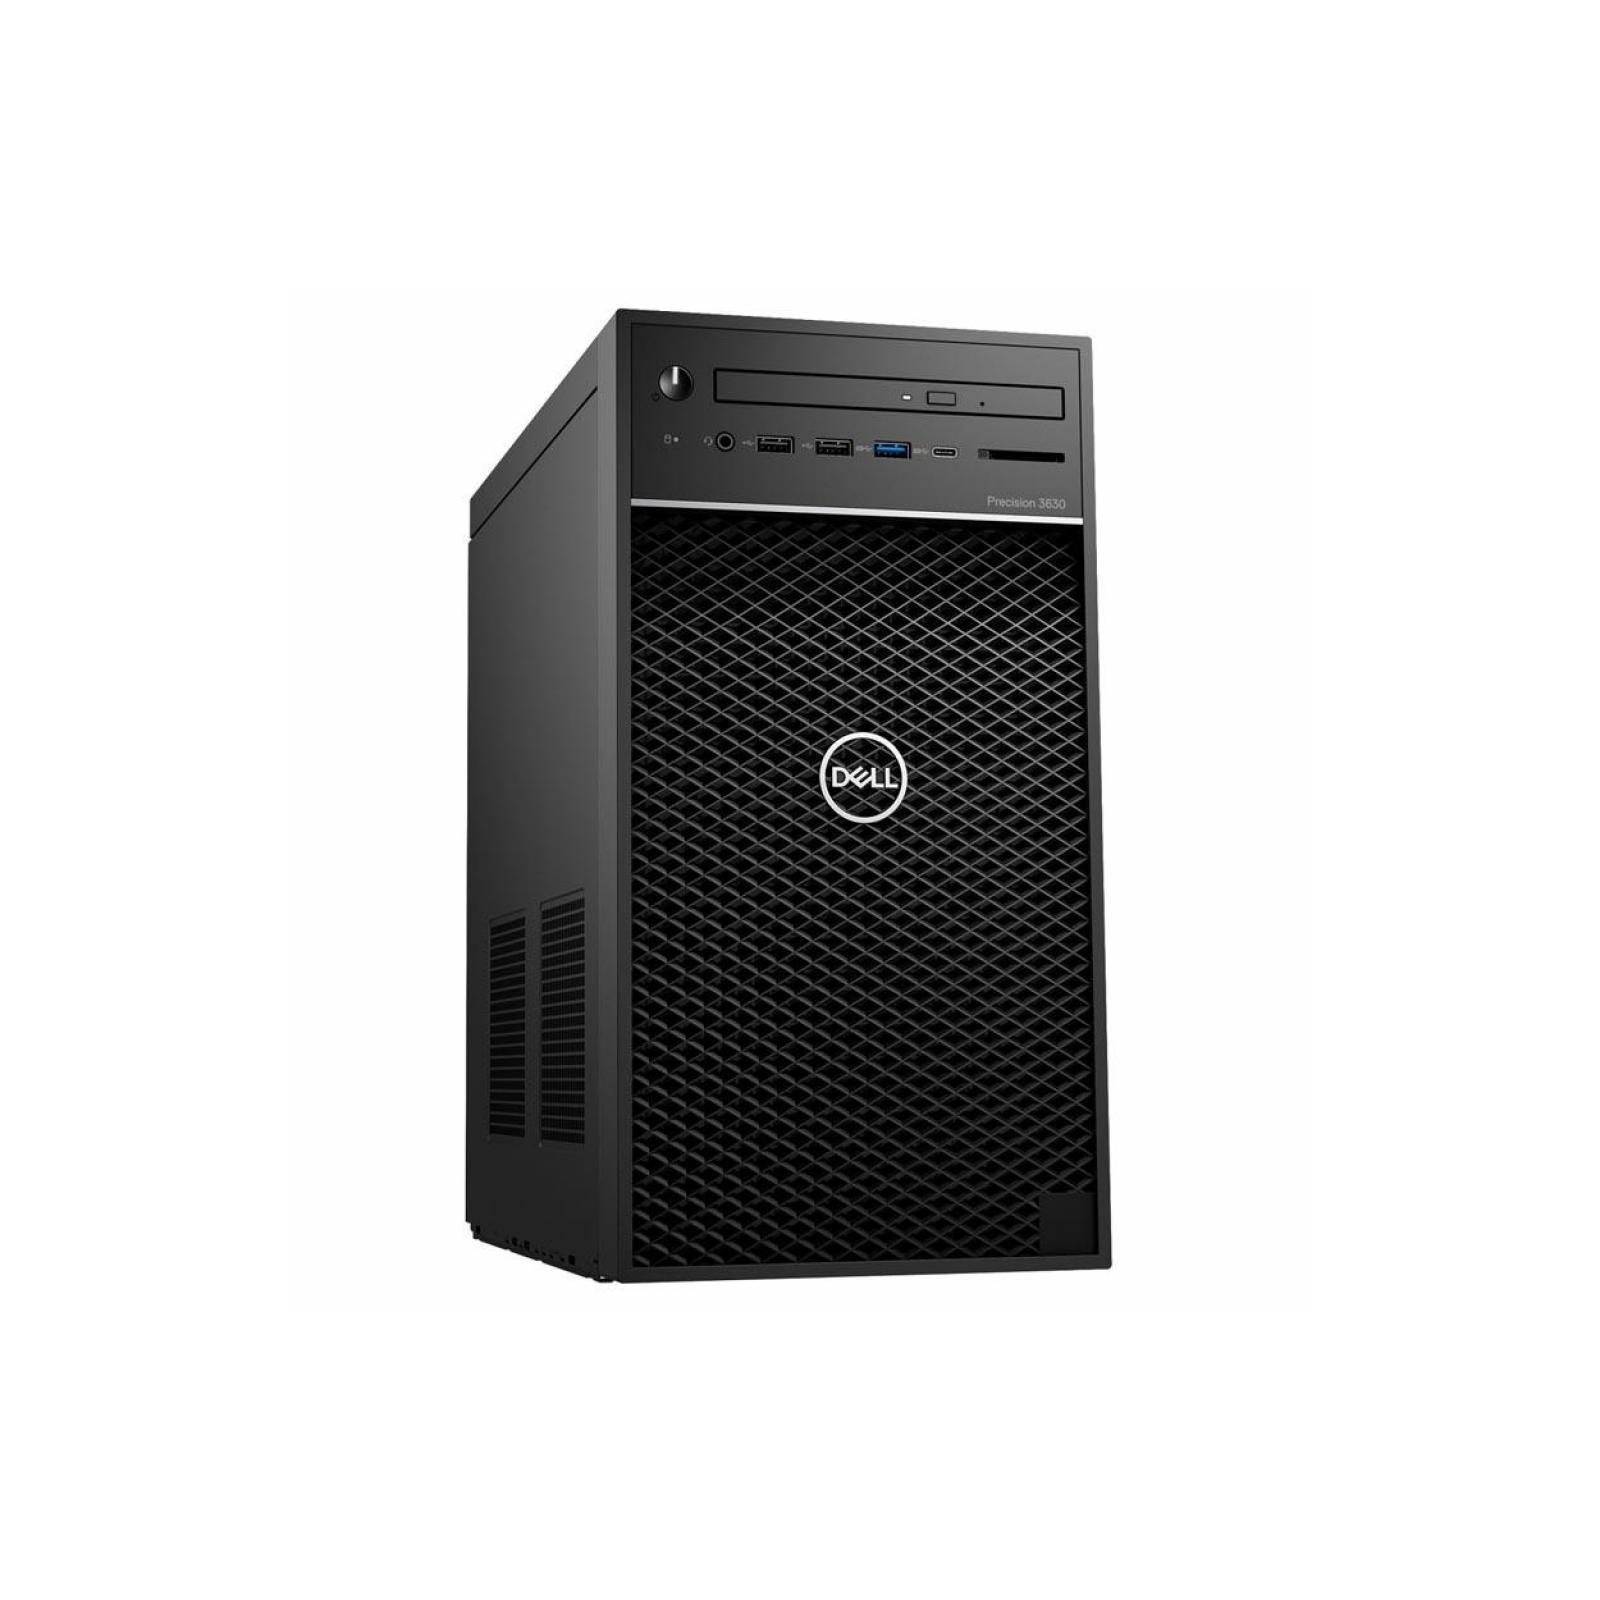 Комп'ютер Dell Precision 3630 Tower/ Xeon E-2124G (210-AOZN-DIX#1-08) зображення 3